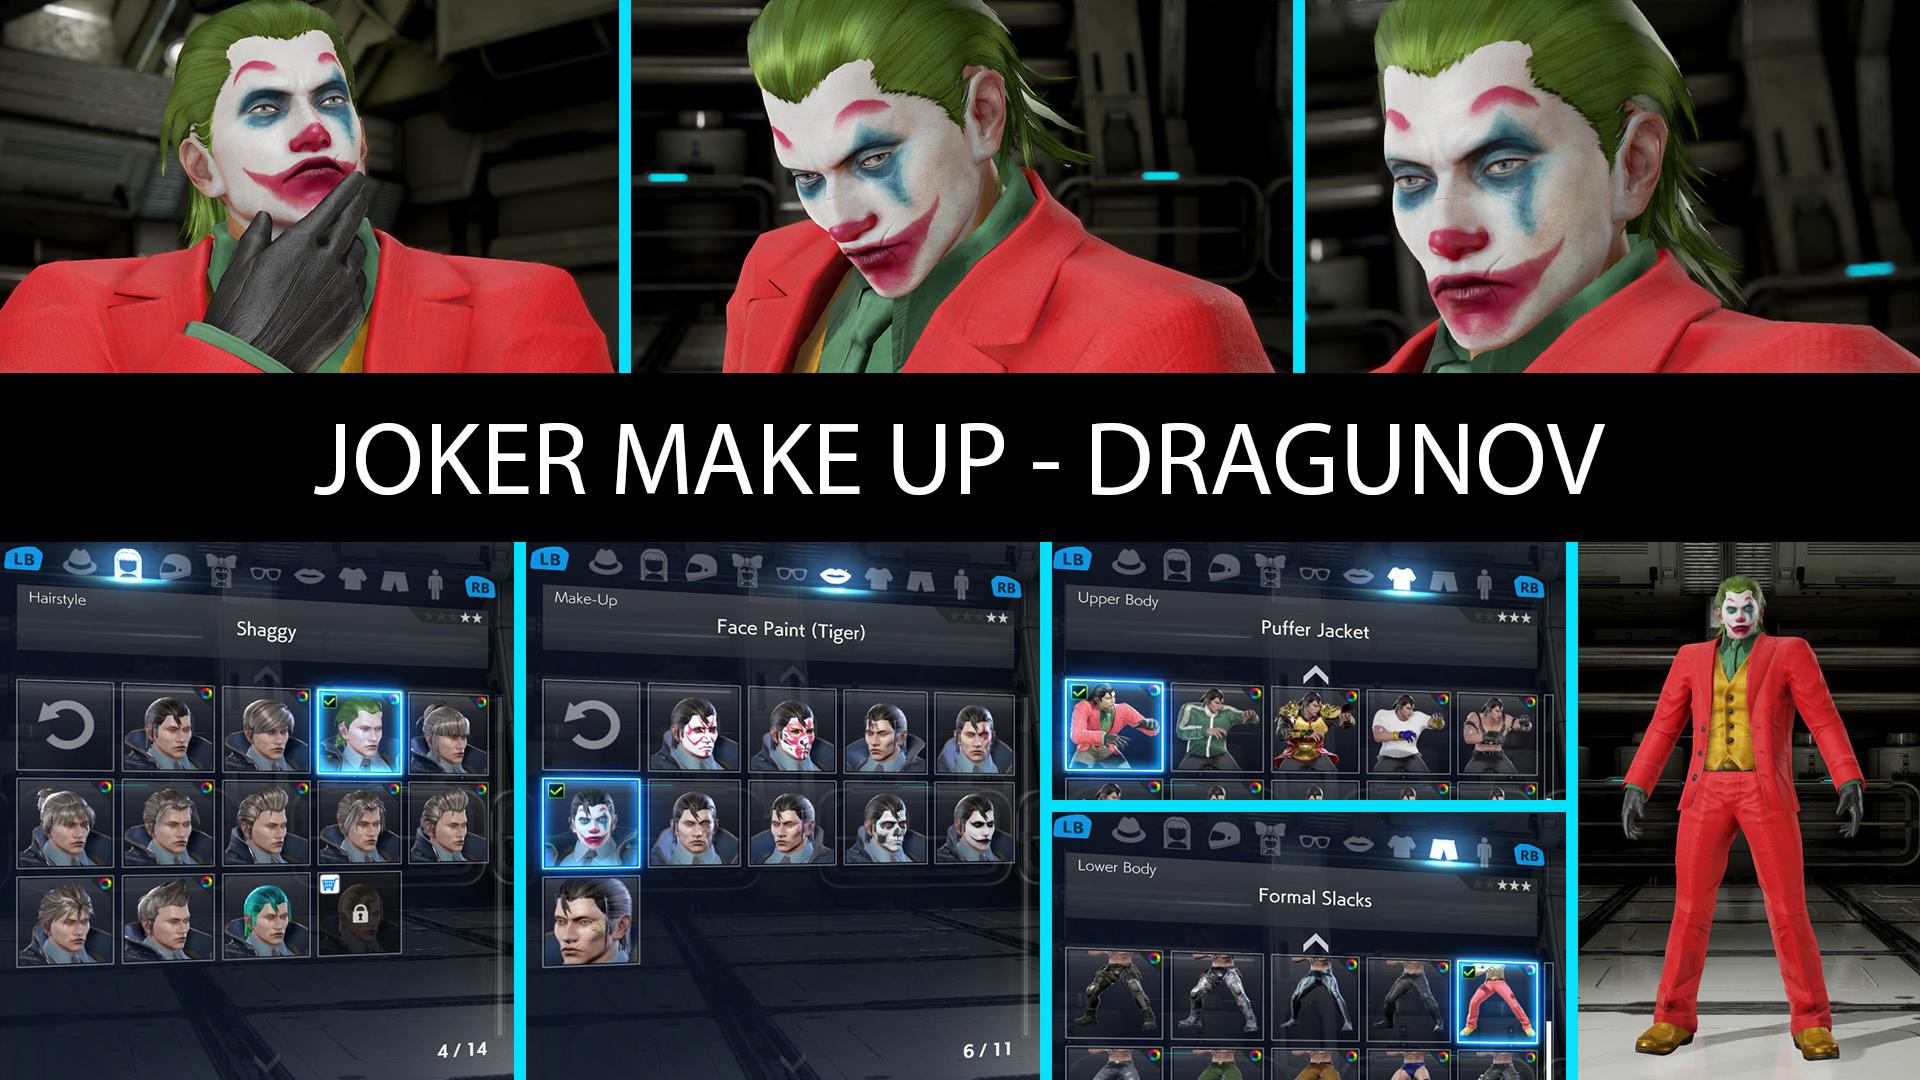 Skin Dragunov Joker By Ponx On Deviantart